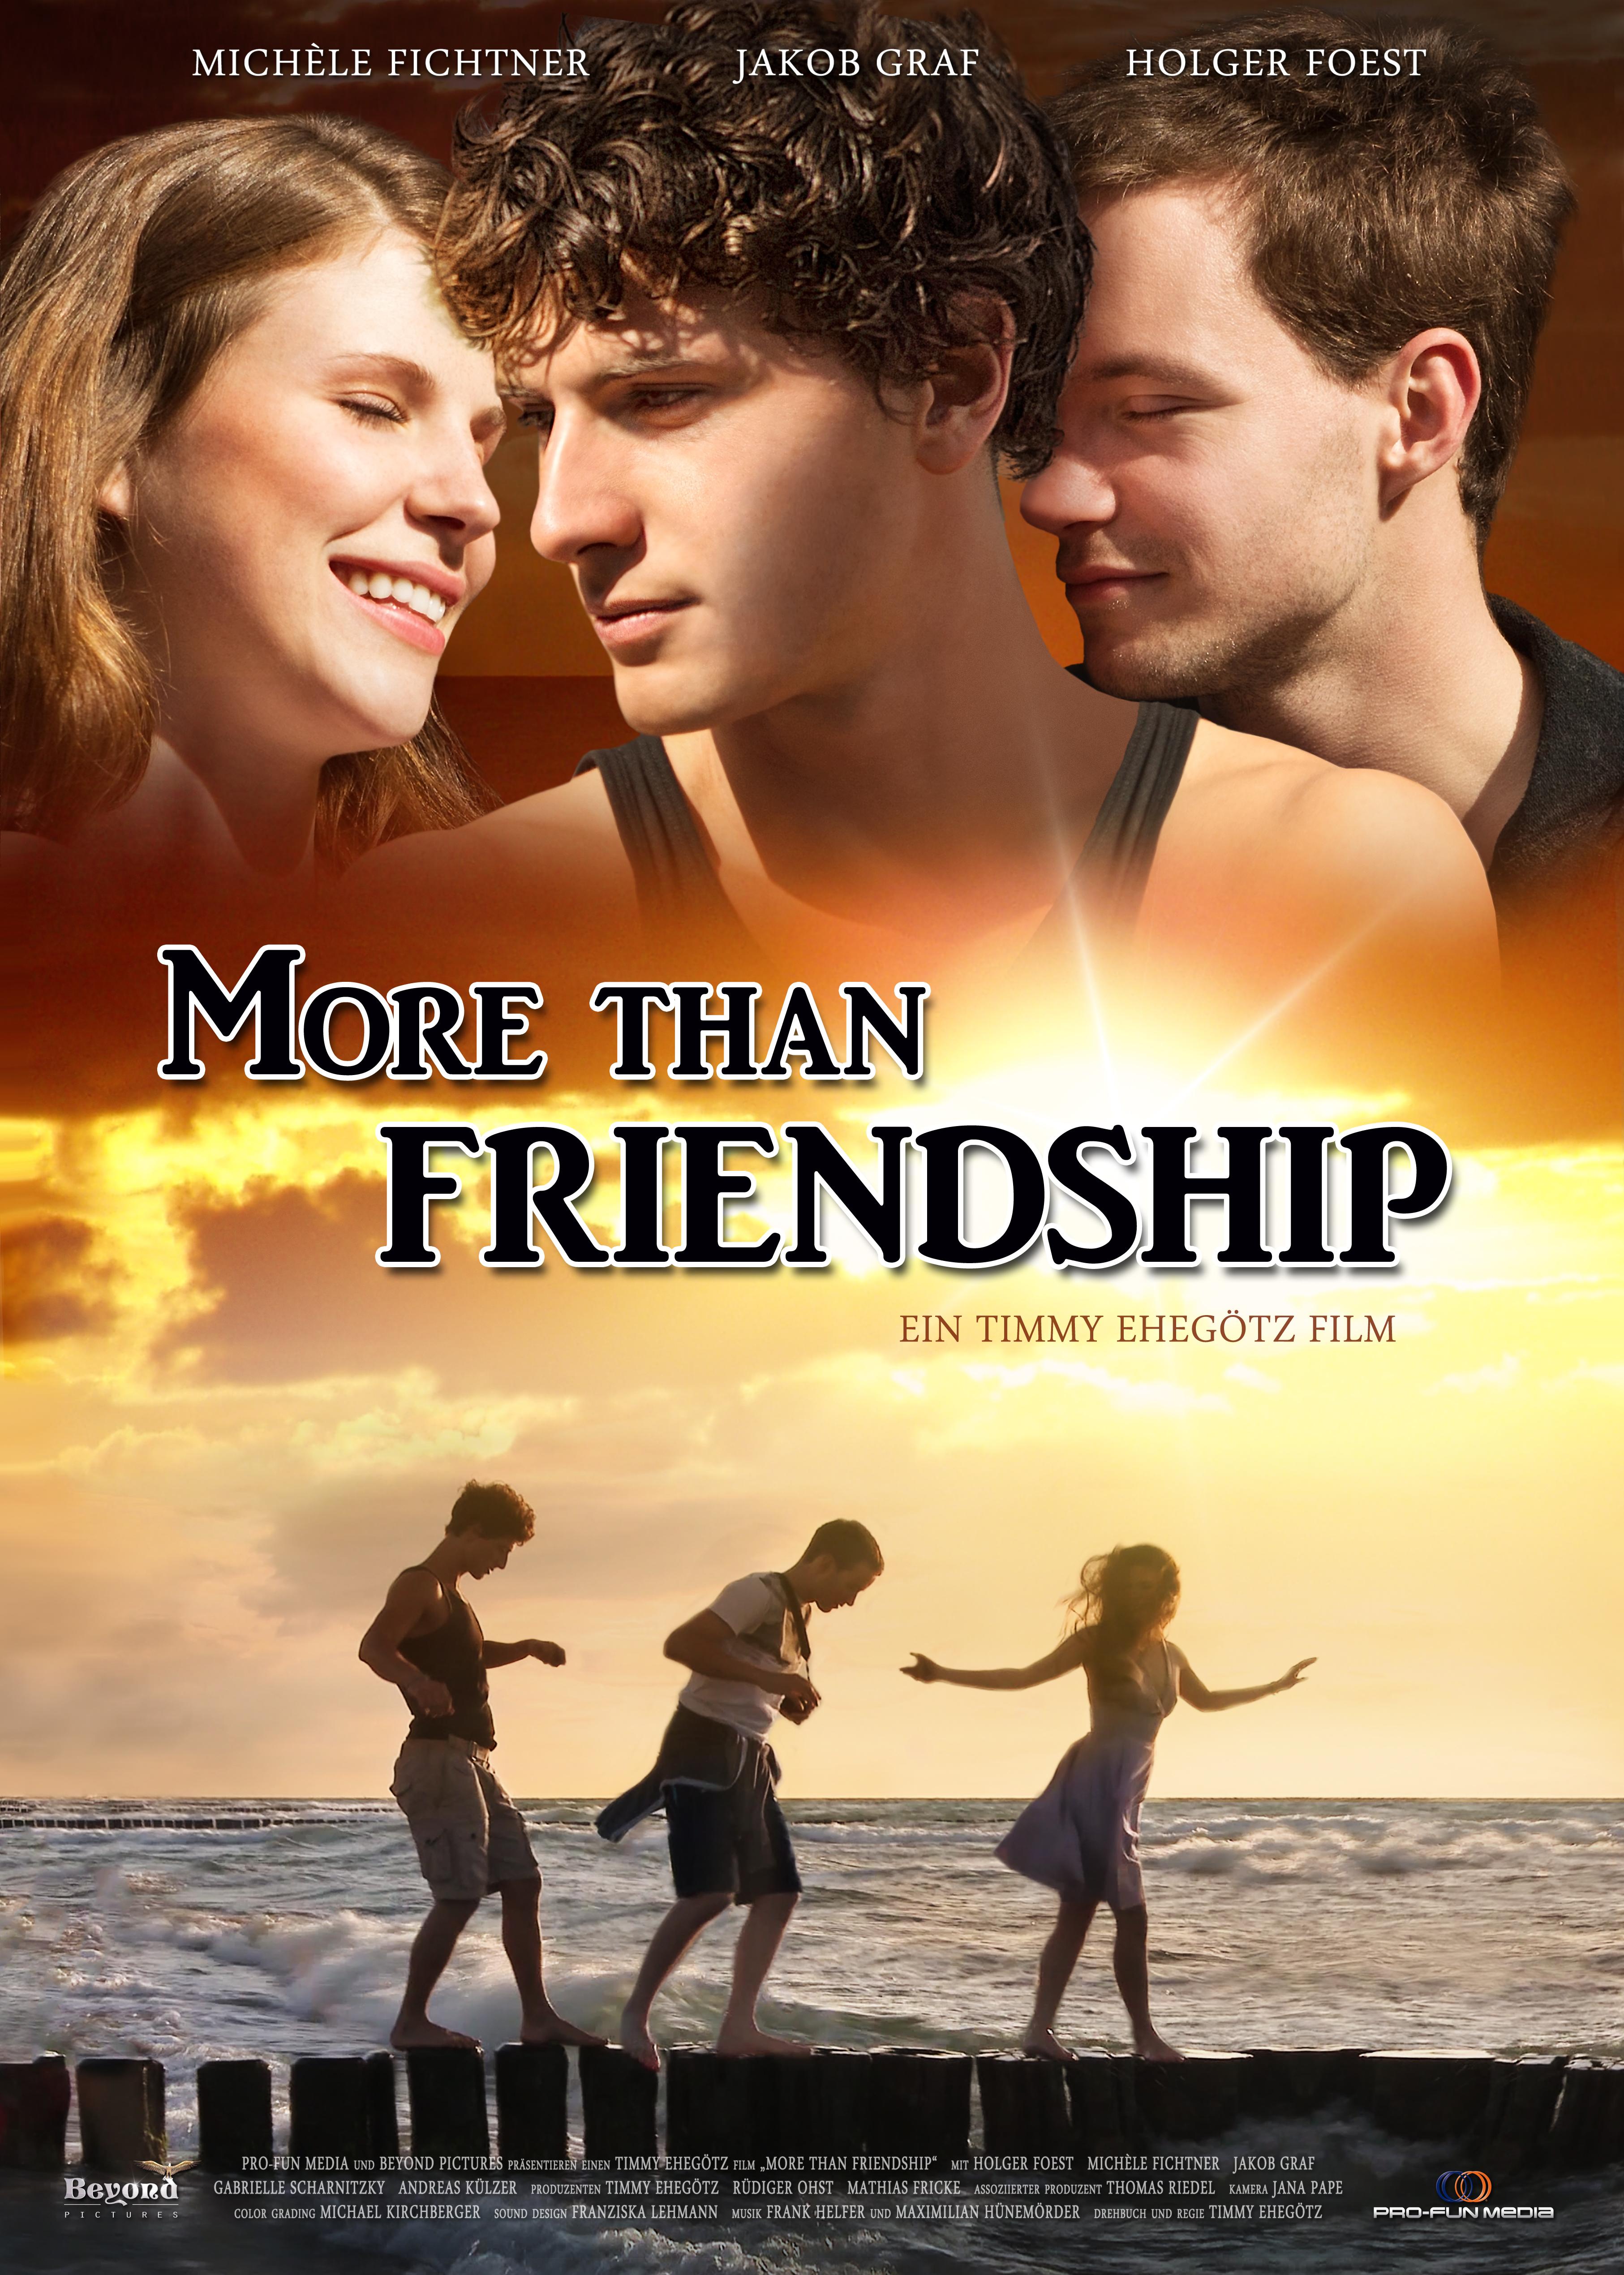 More_than_friendship-Filmplakat1